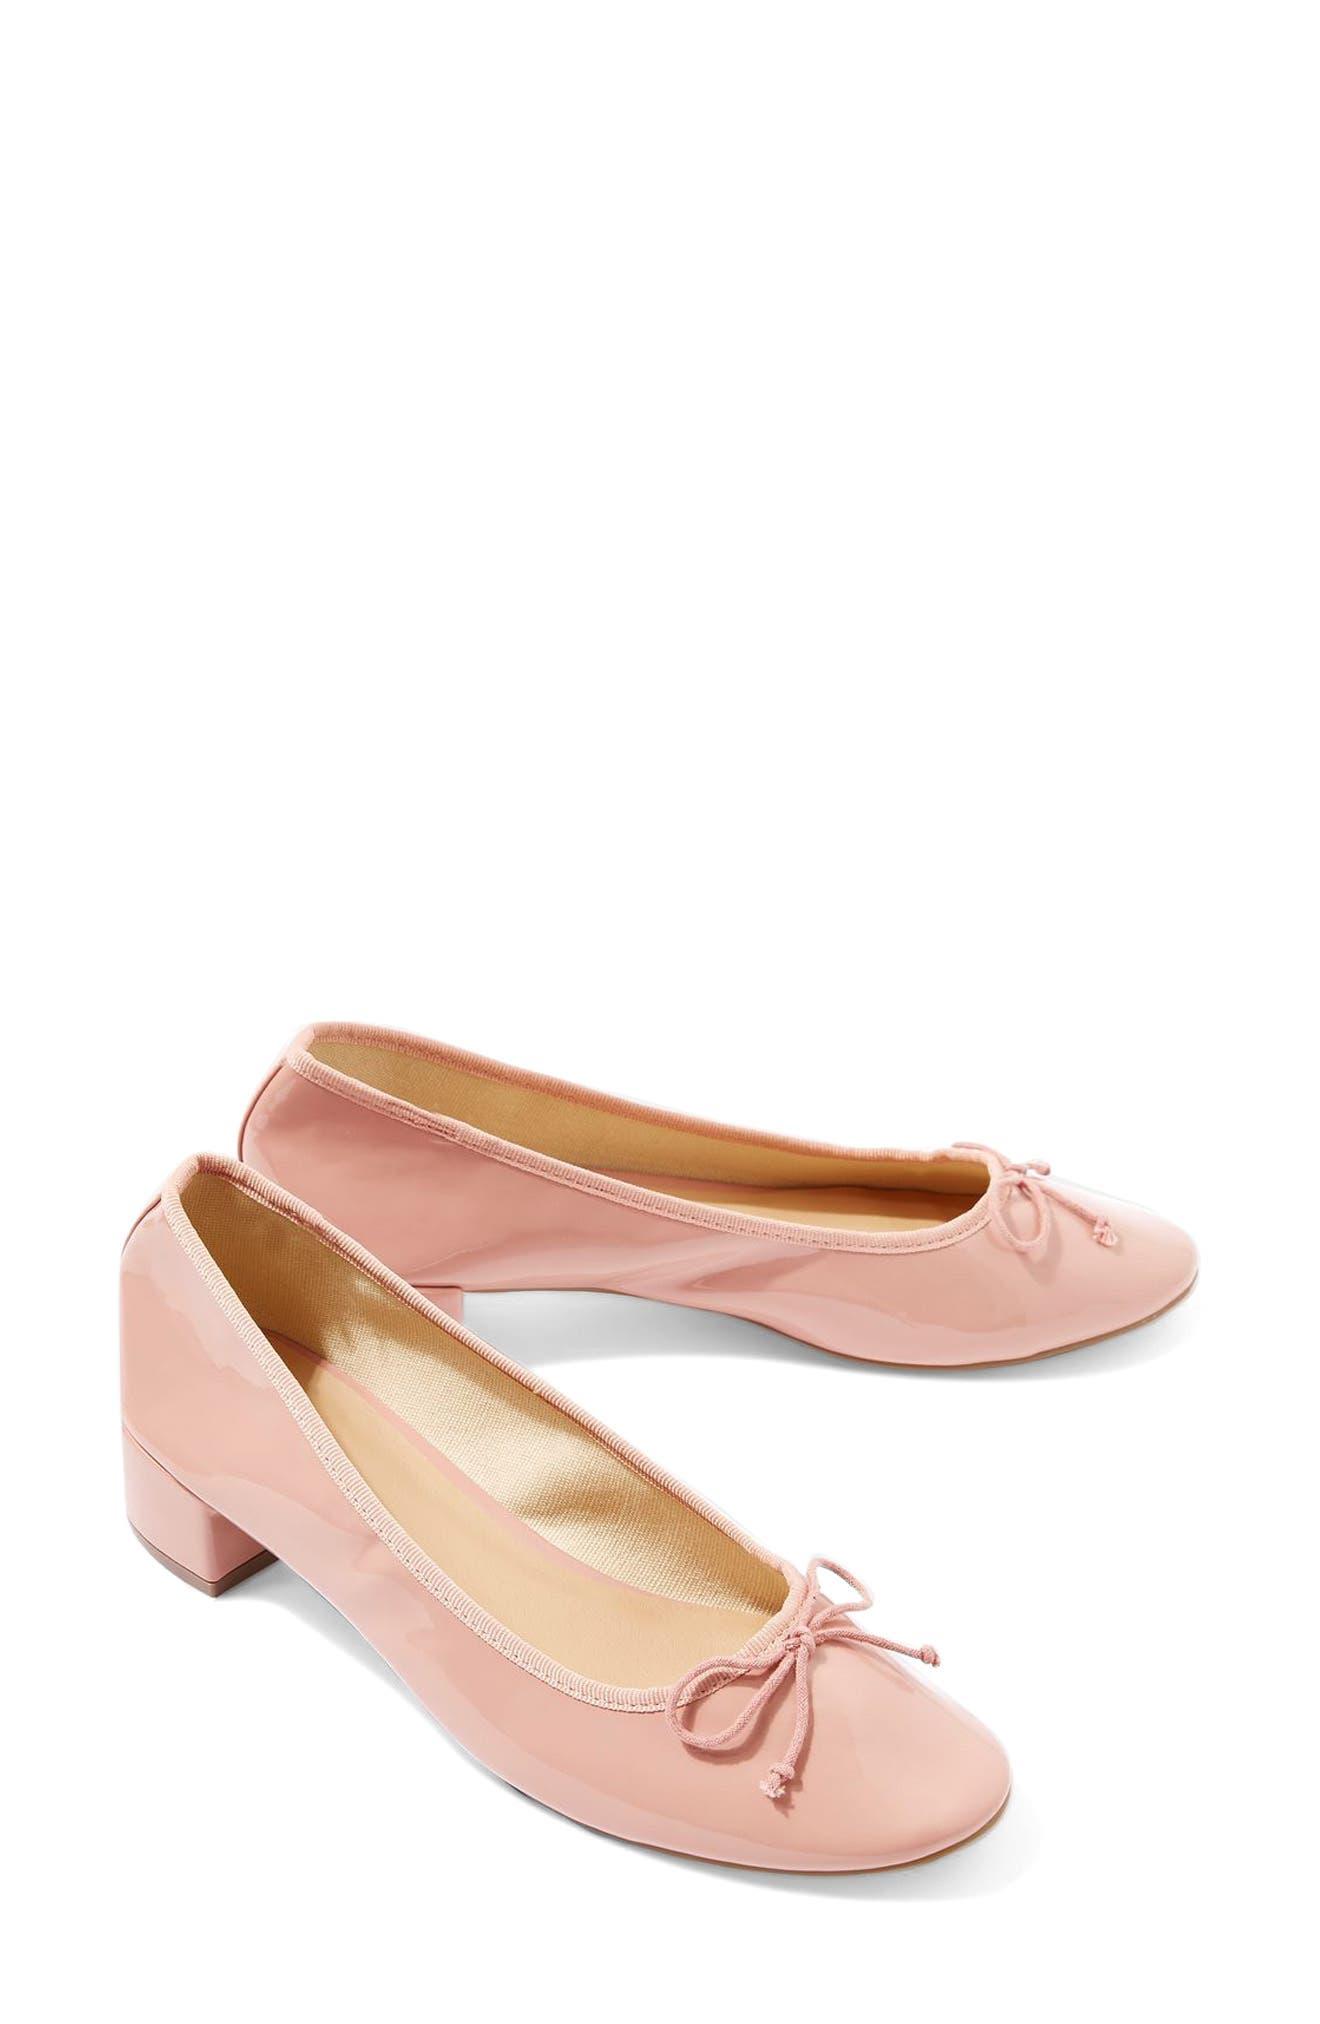 Main Image - Topshop Glory Heeled Ballerina Slippers